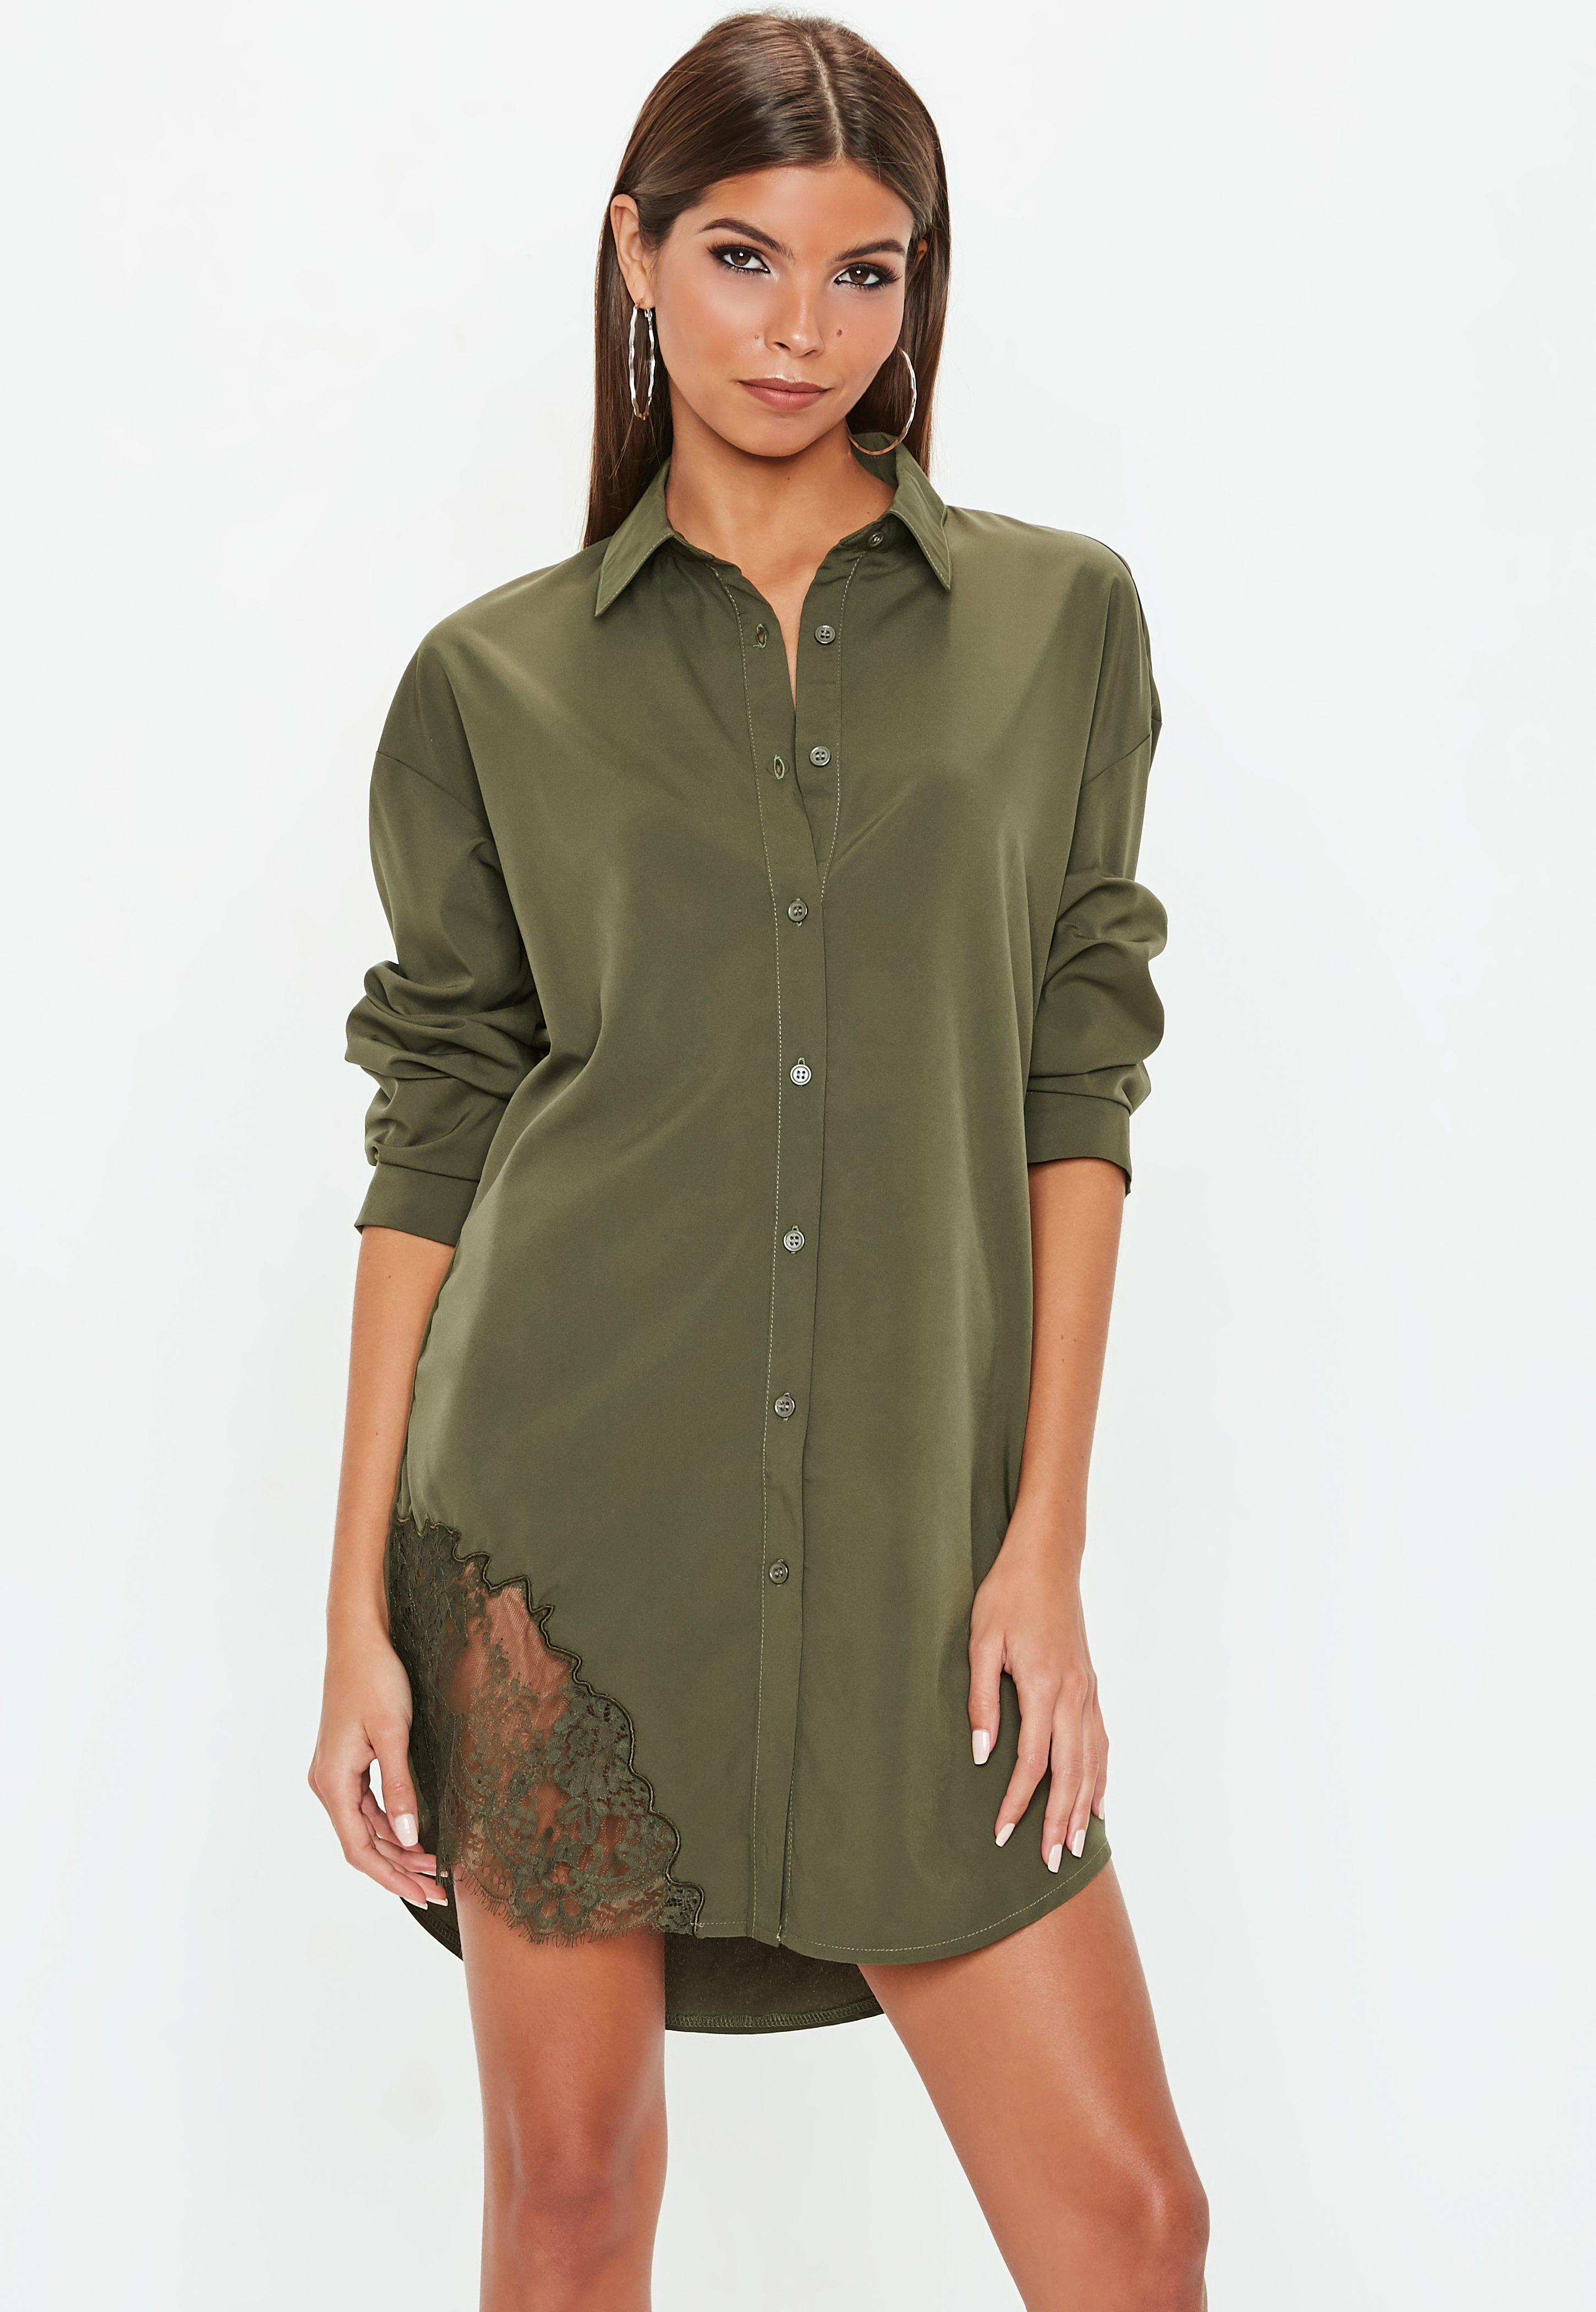 Khaki Lace Trim Shirt Dress Missguided